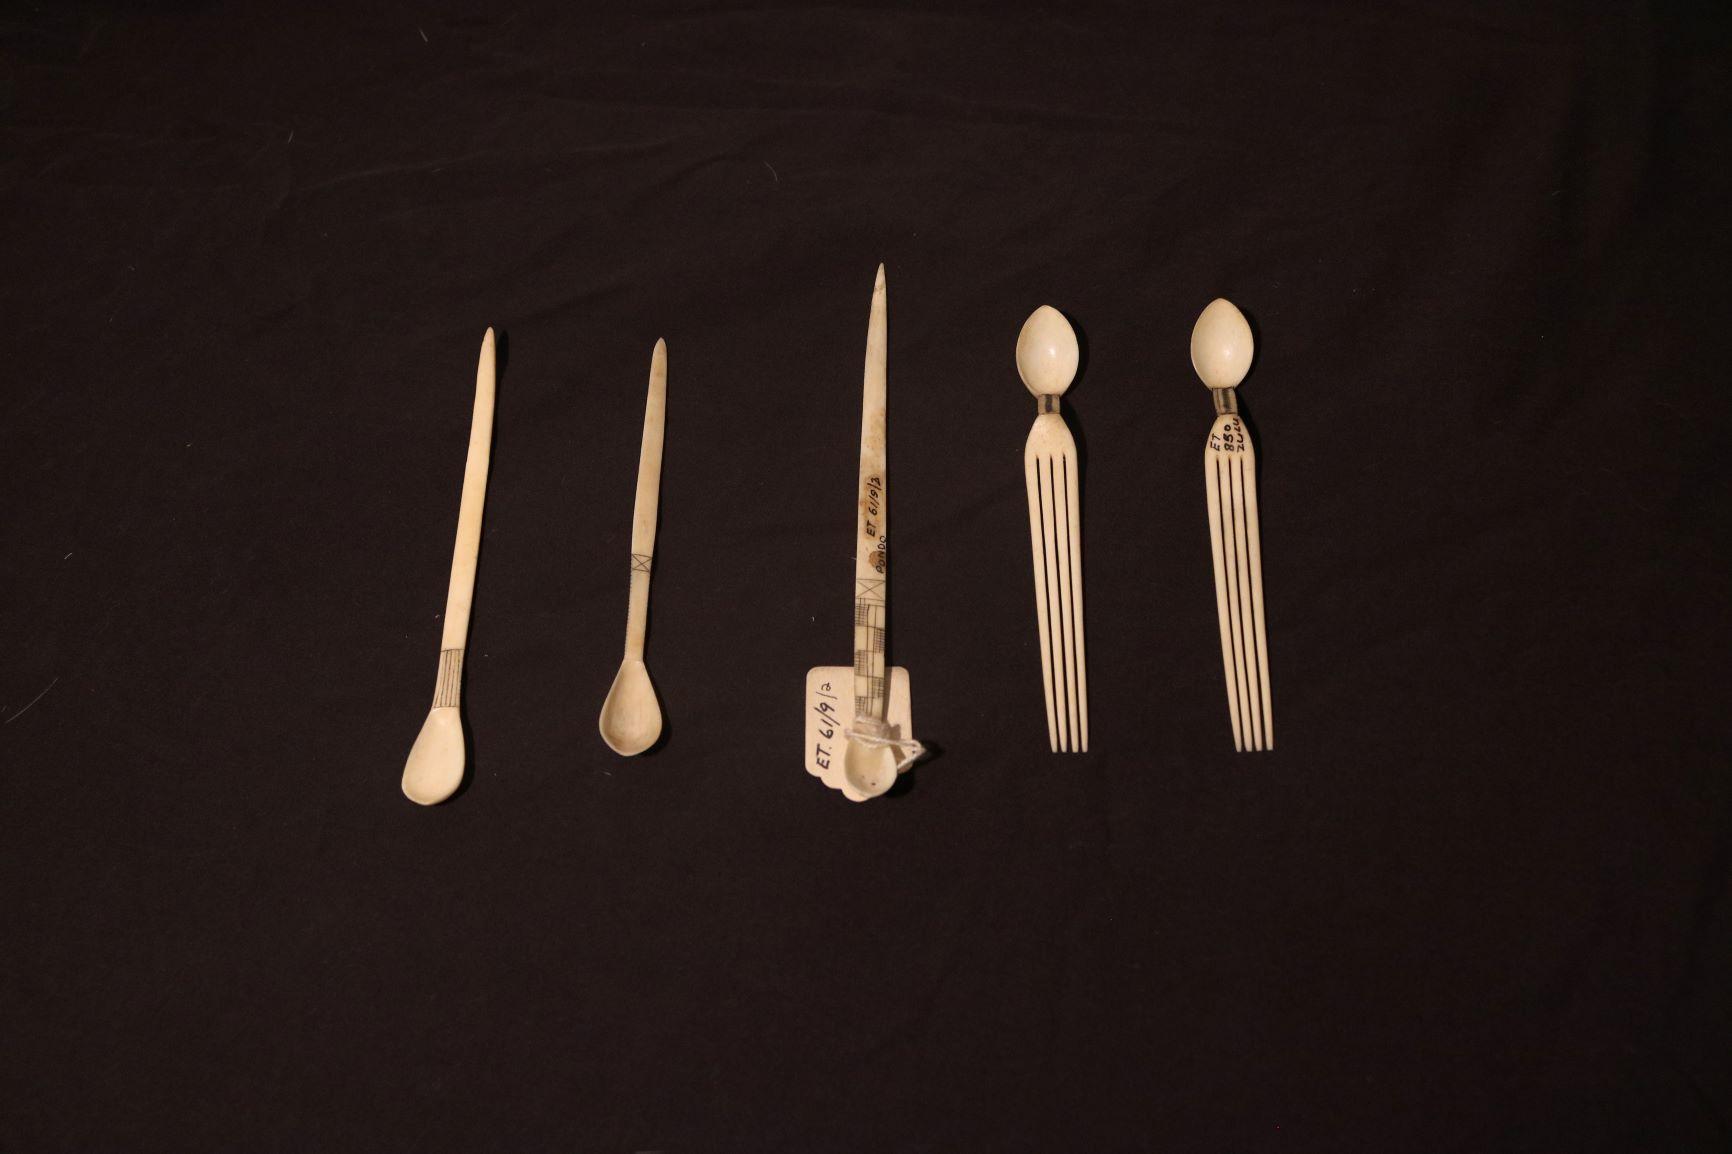 Snuff spoons